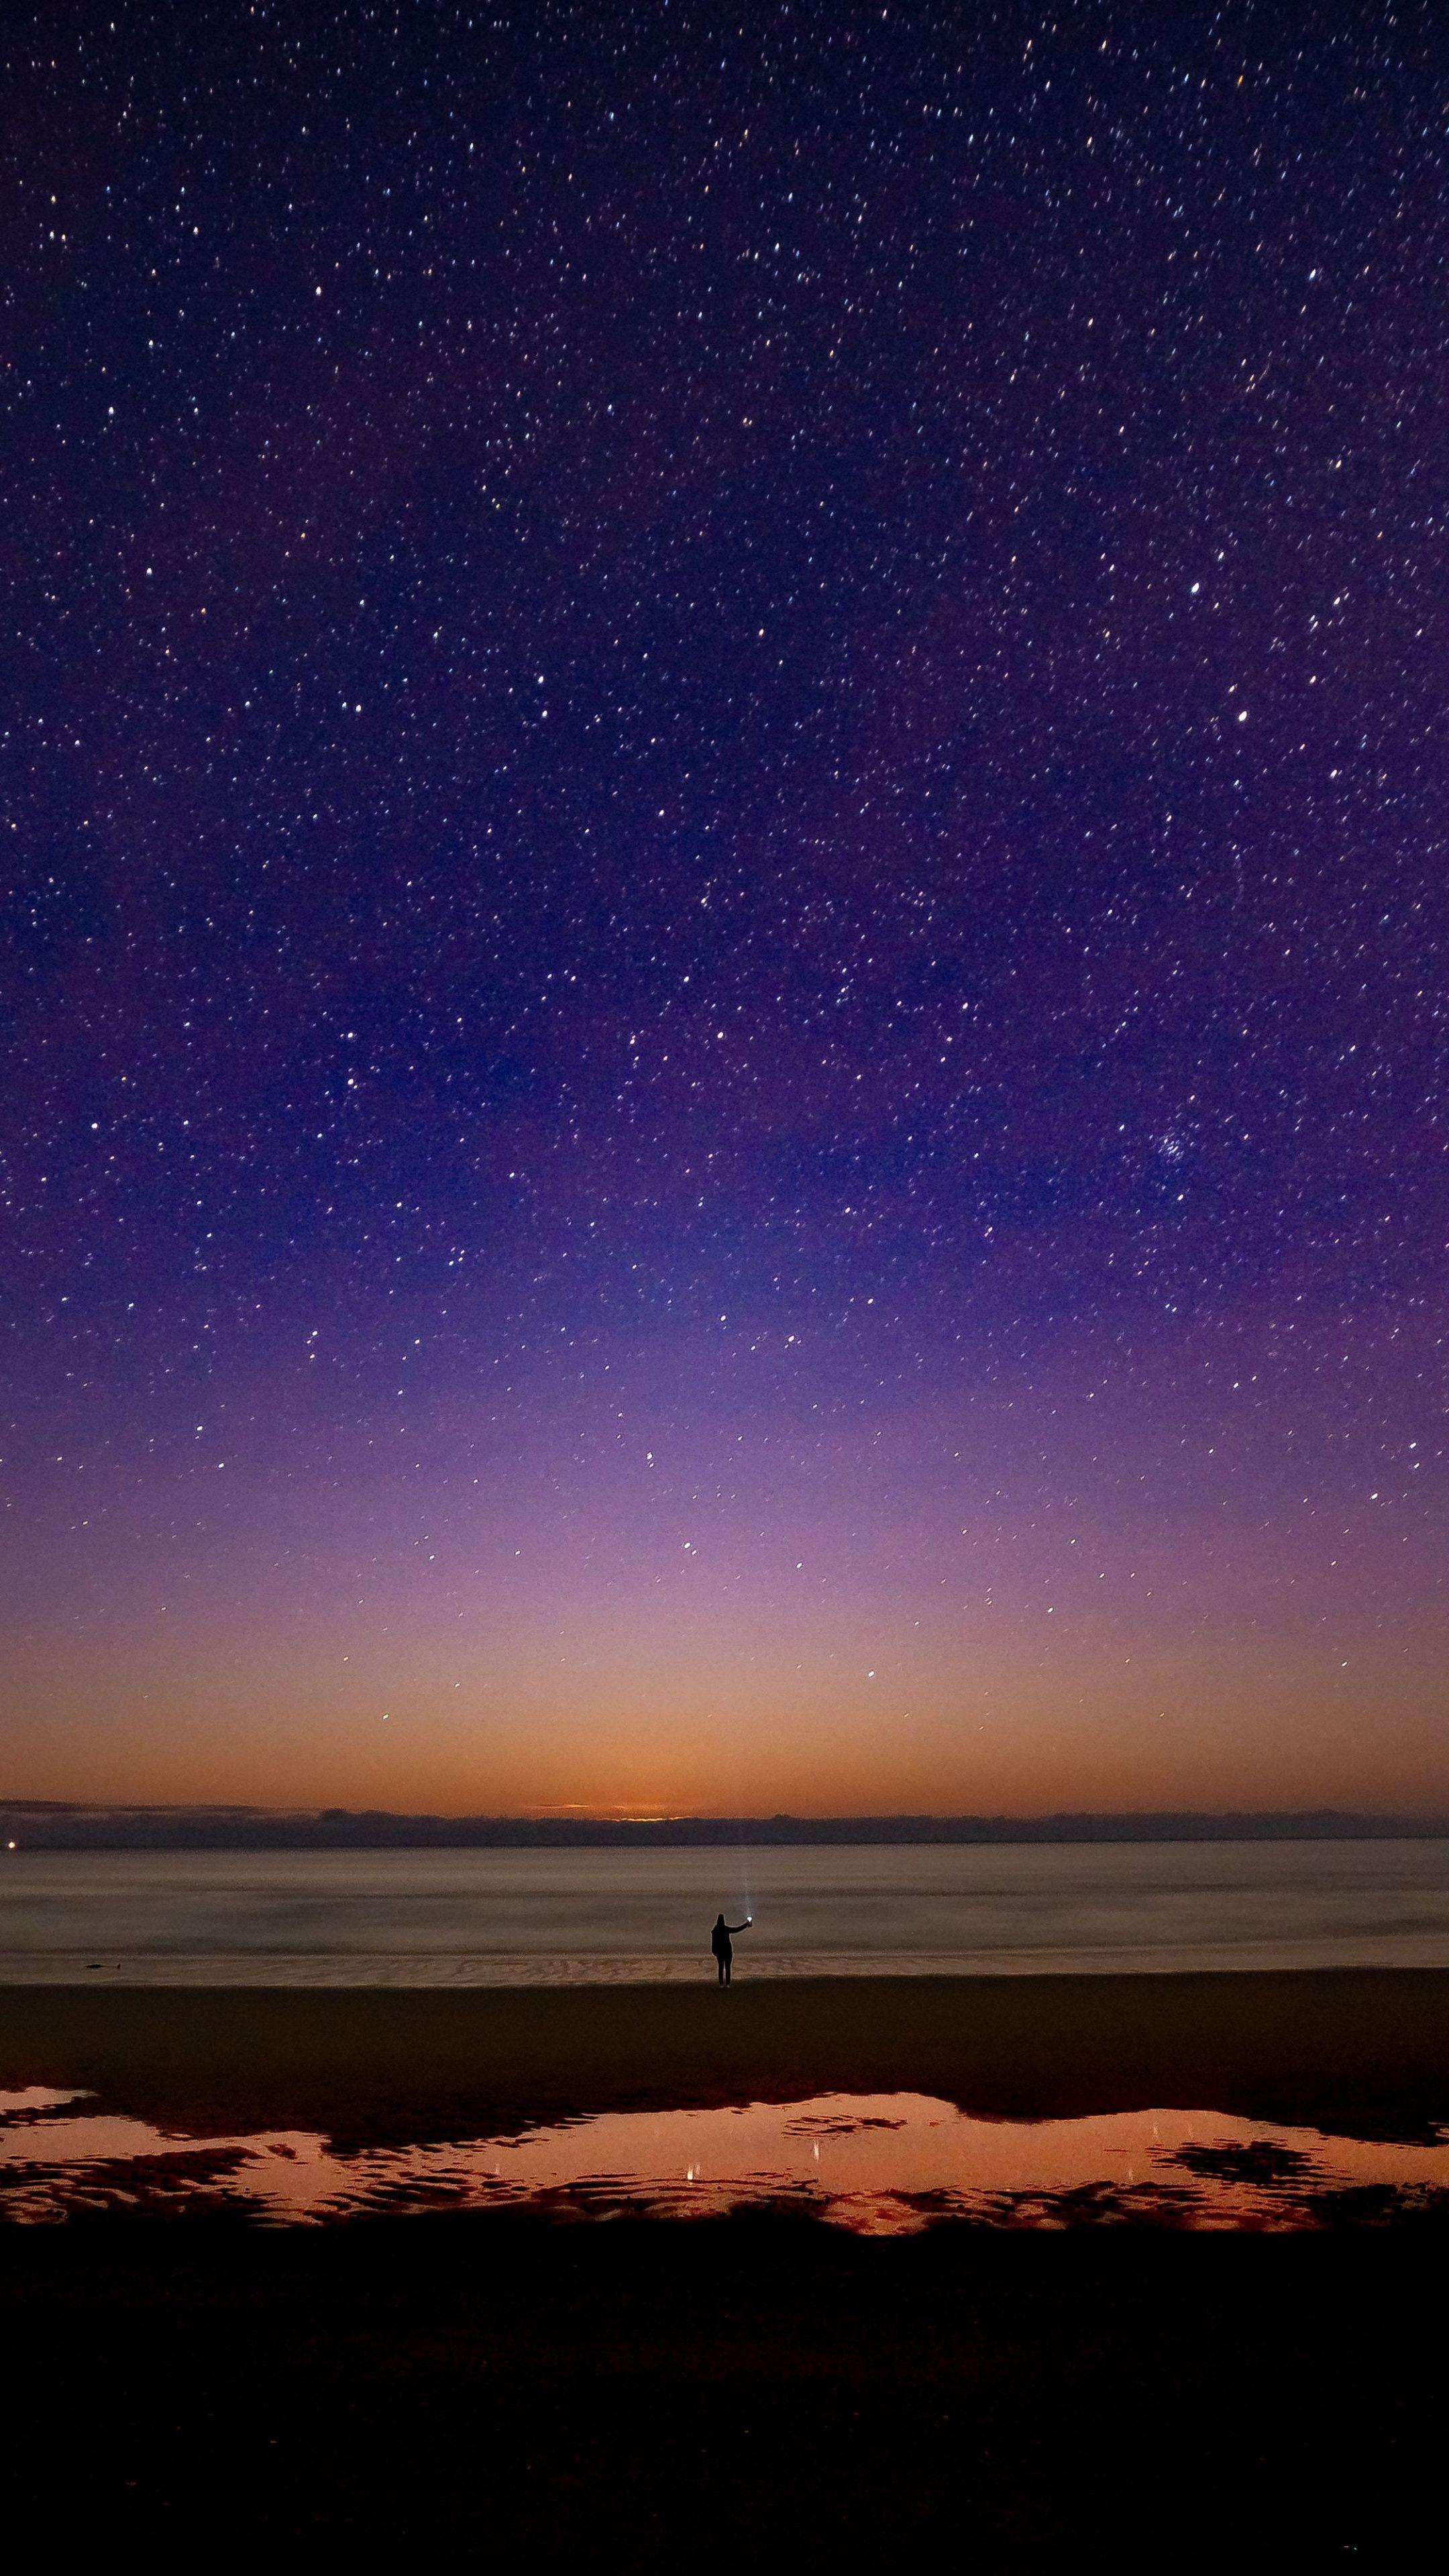 2160x3840 Starry night, sky wallpaper in 2020 Aesthetic